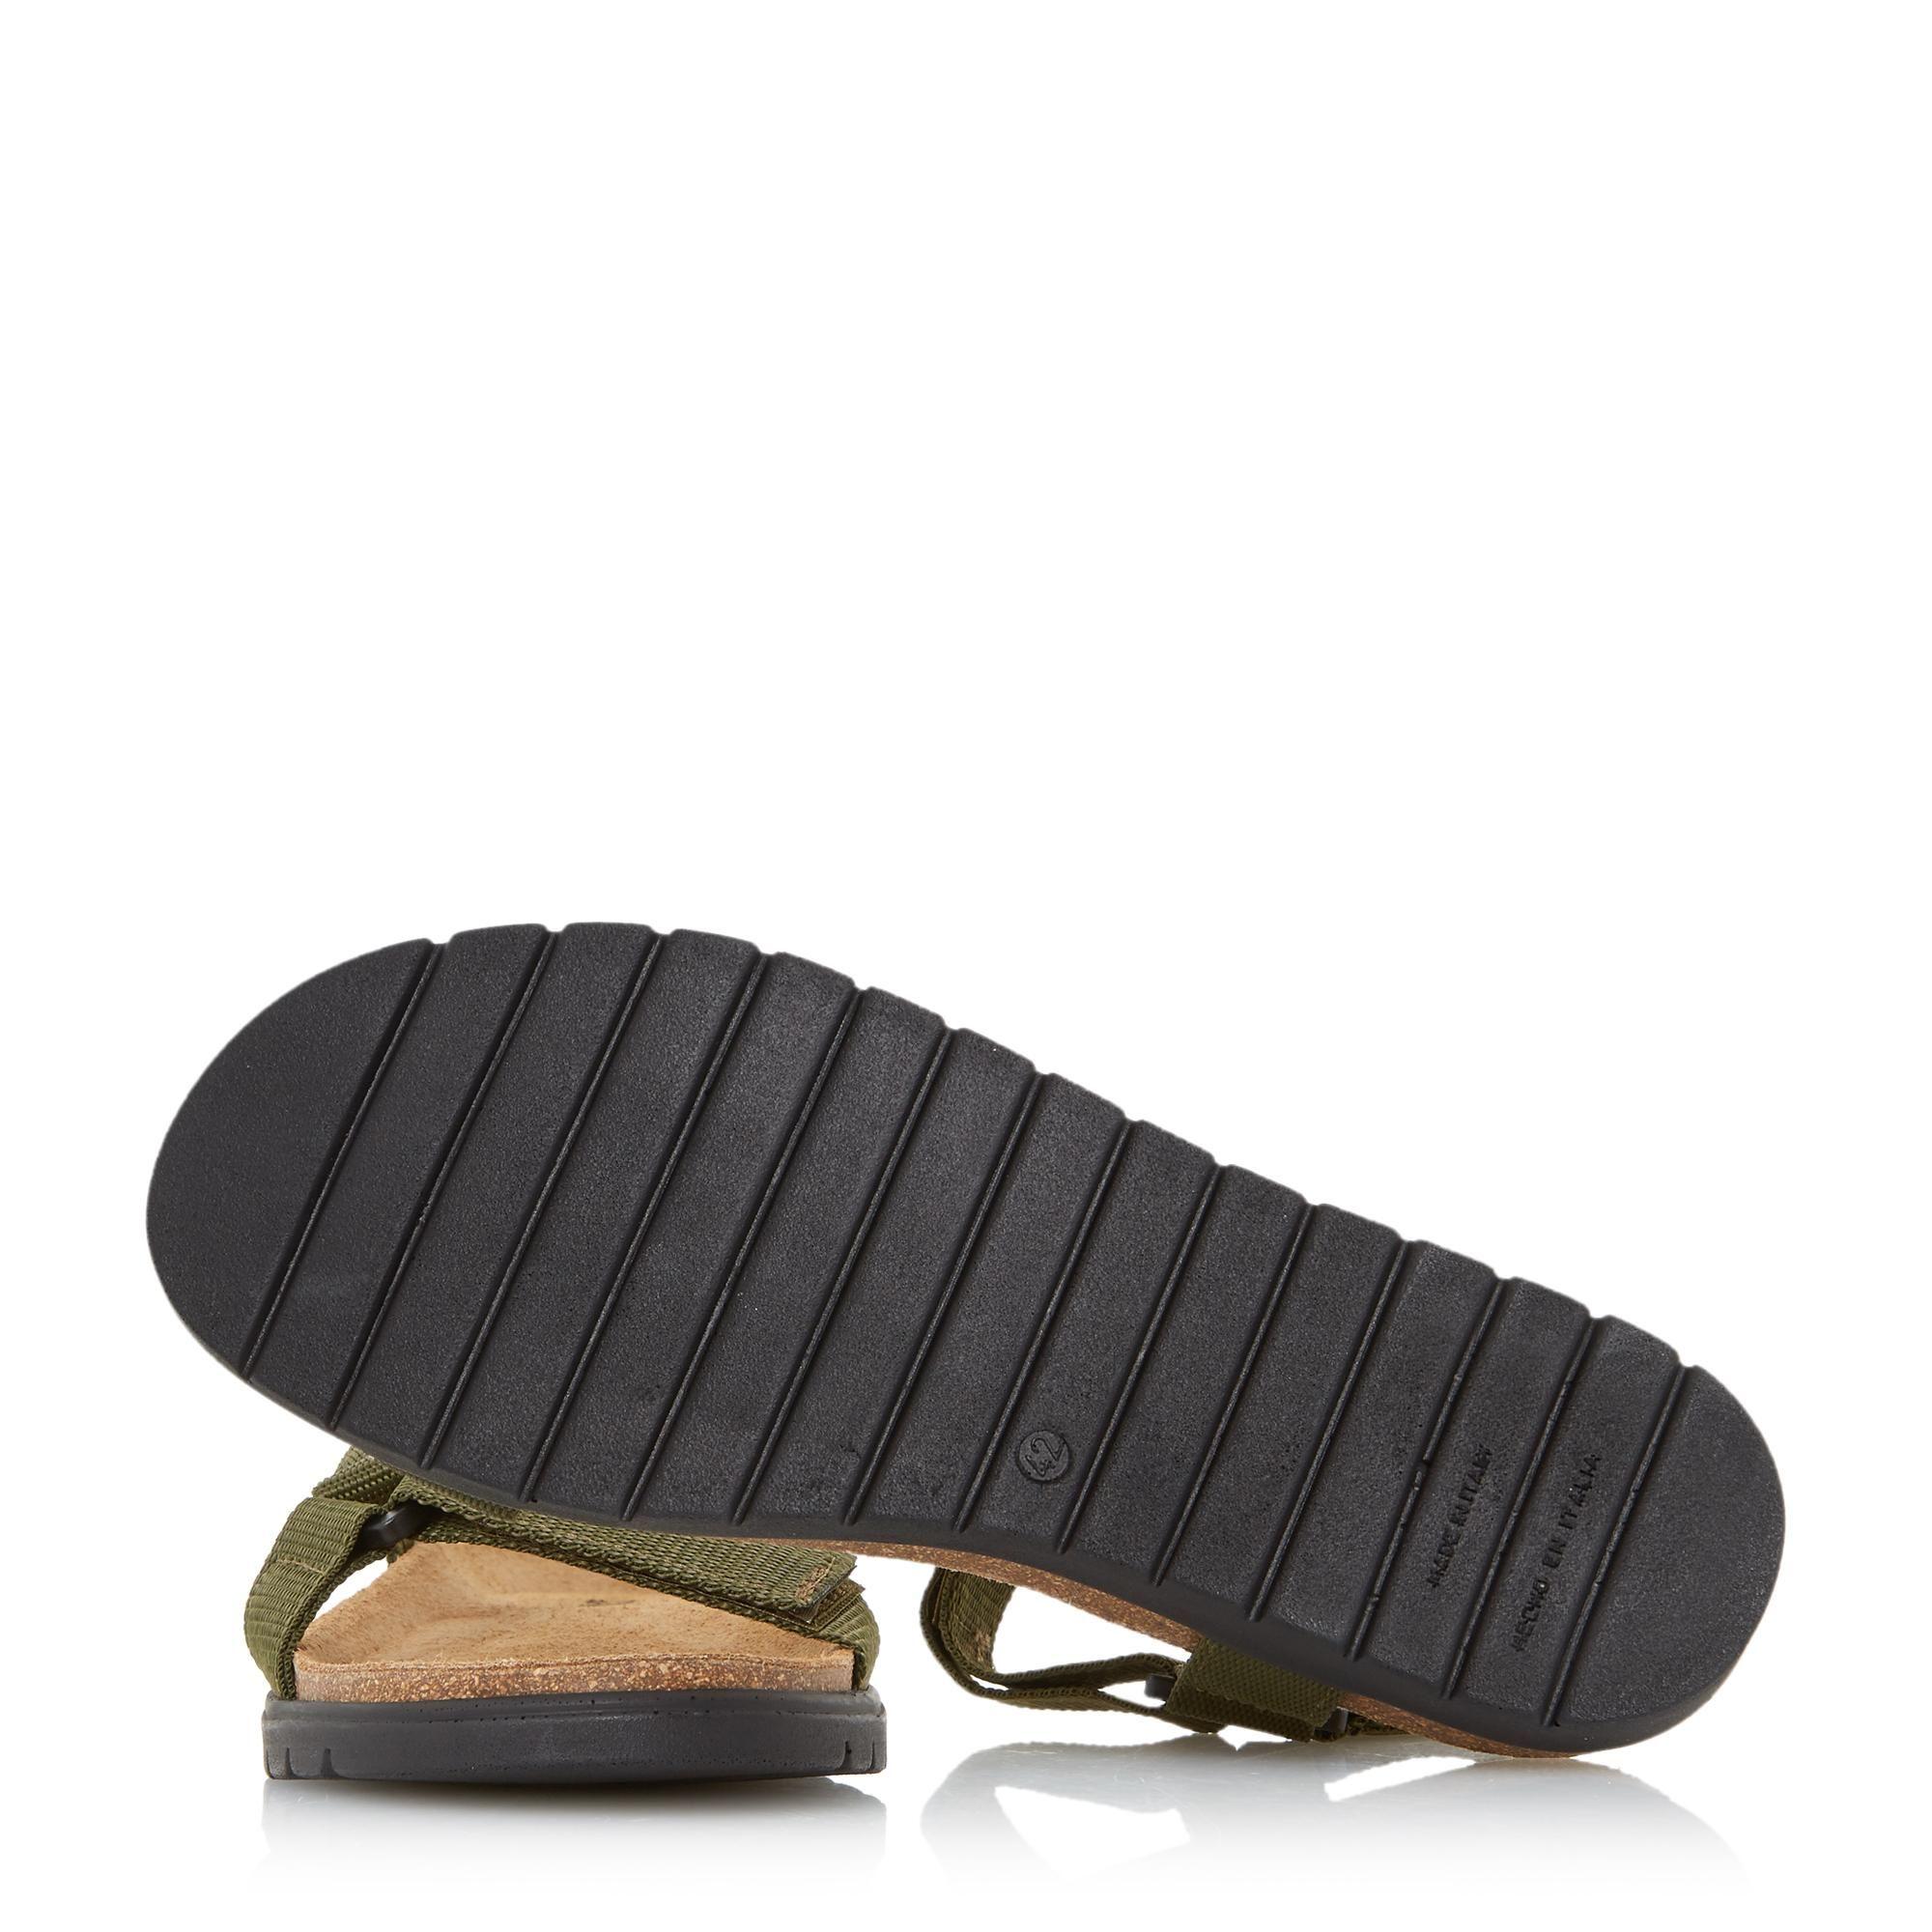 Dune Mens IGGY Rip Tape Adventure Sandals